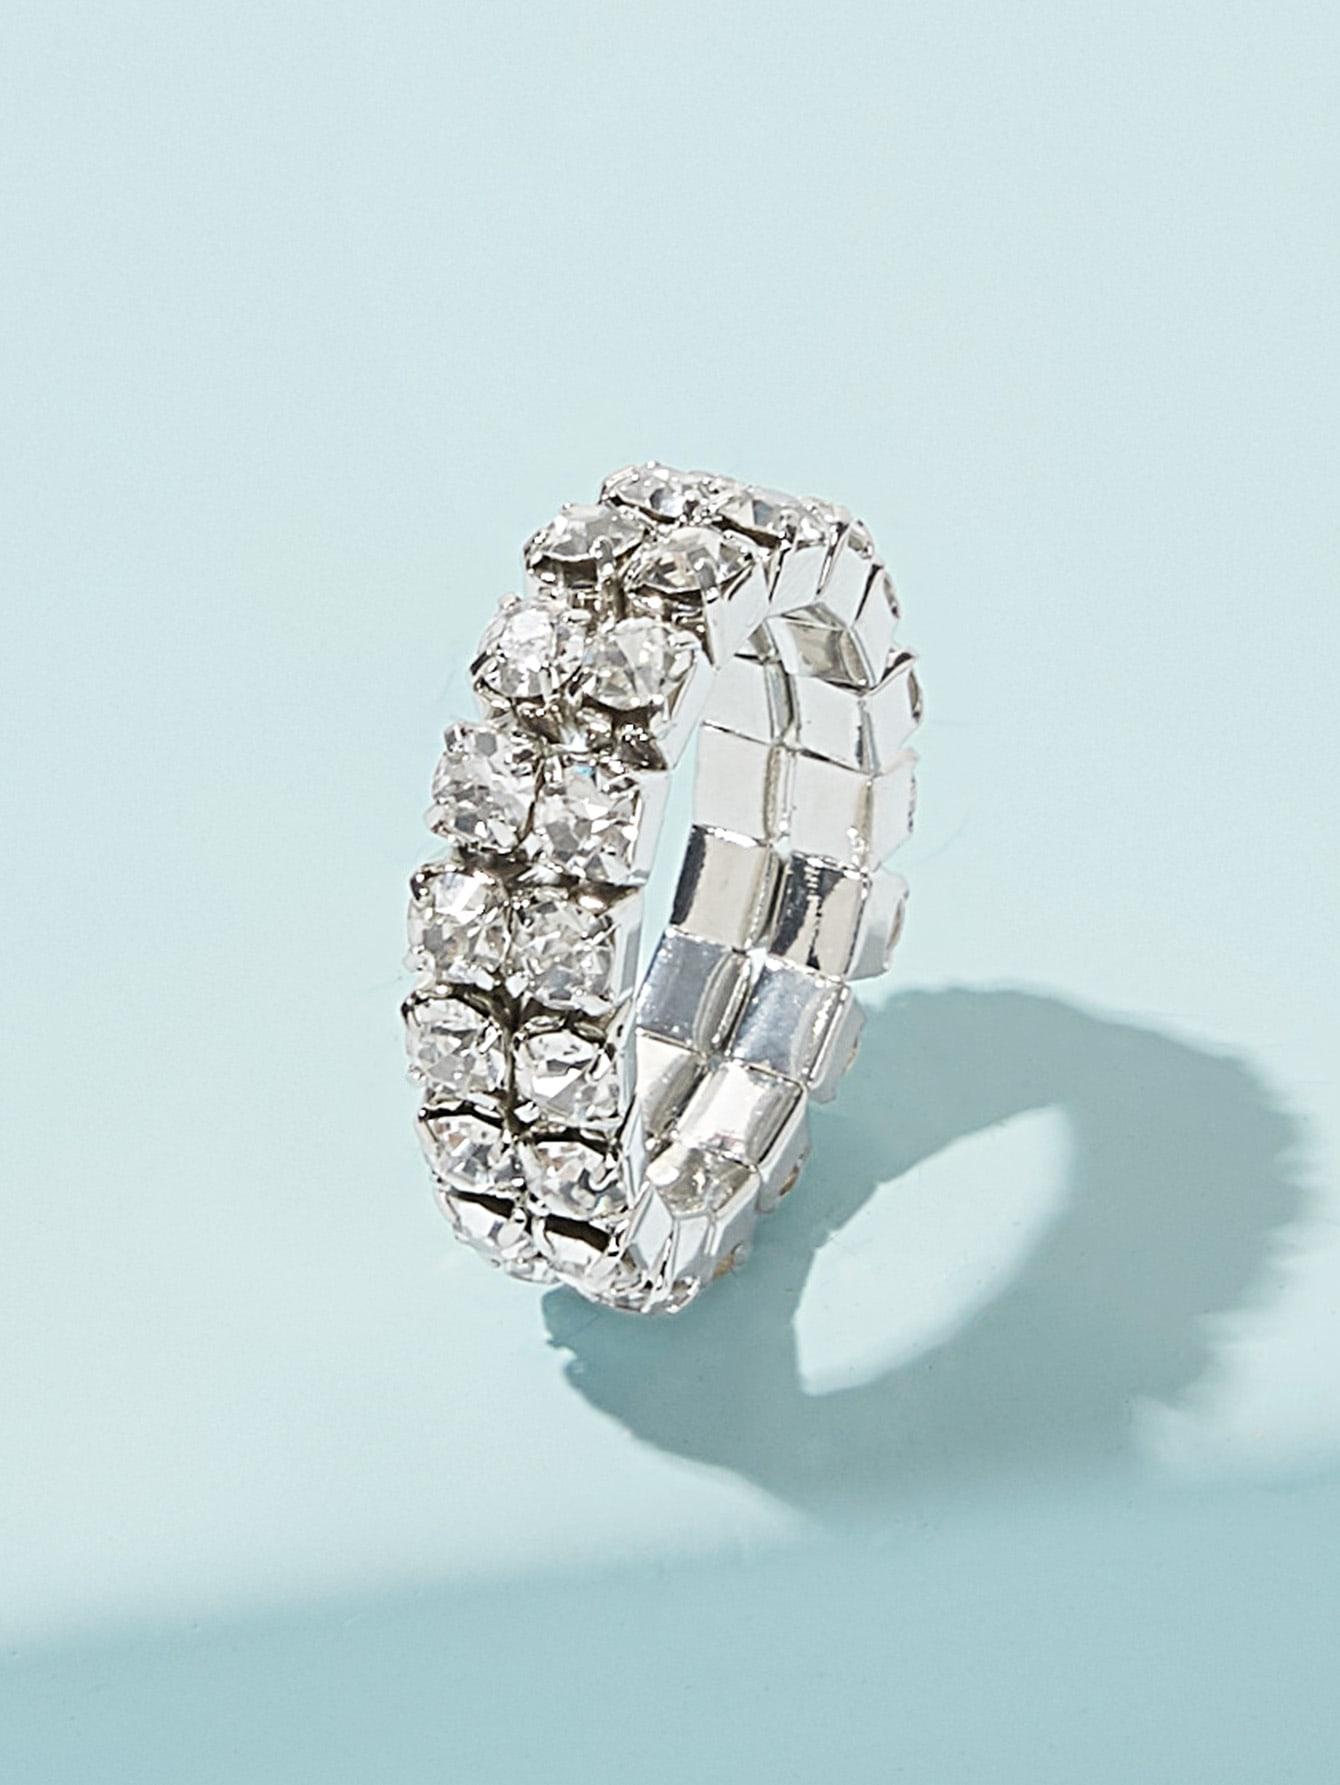 Double Layered Rhinestone Decor Ring 1pc thumbnail